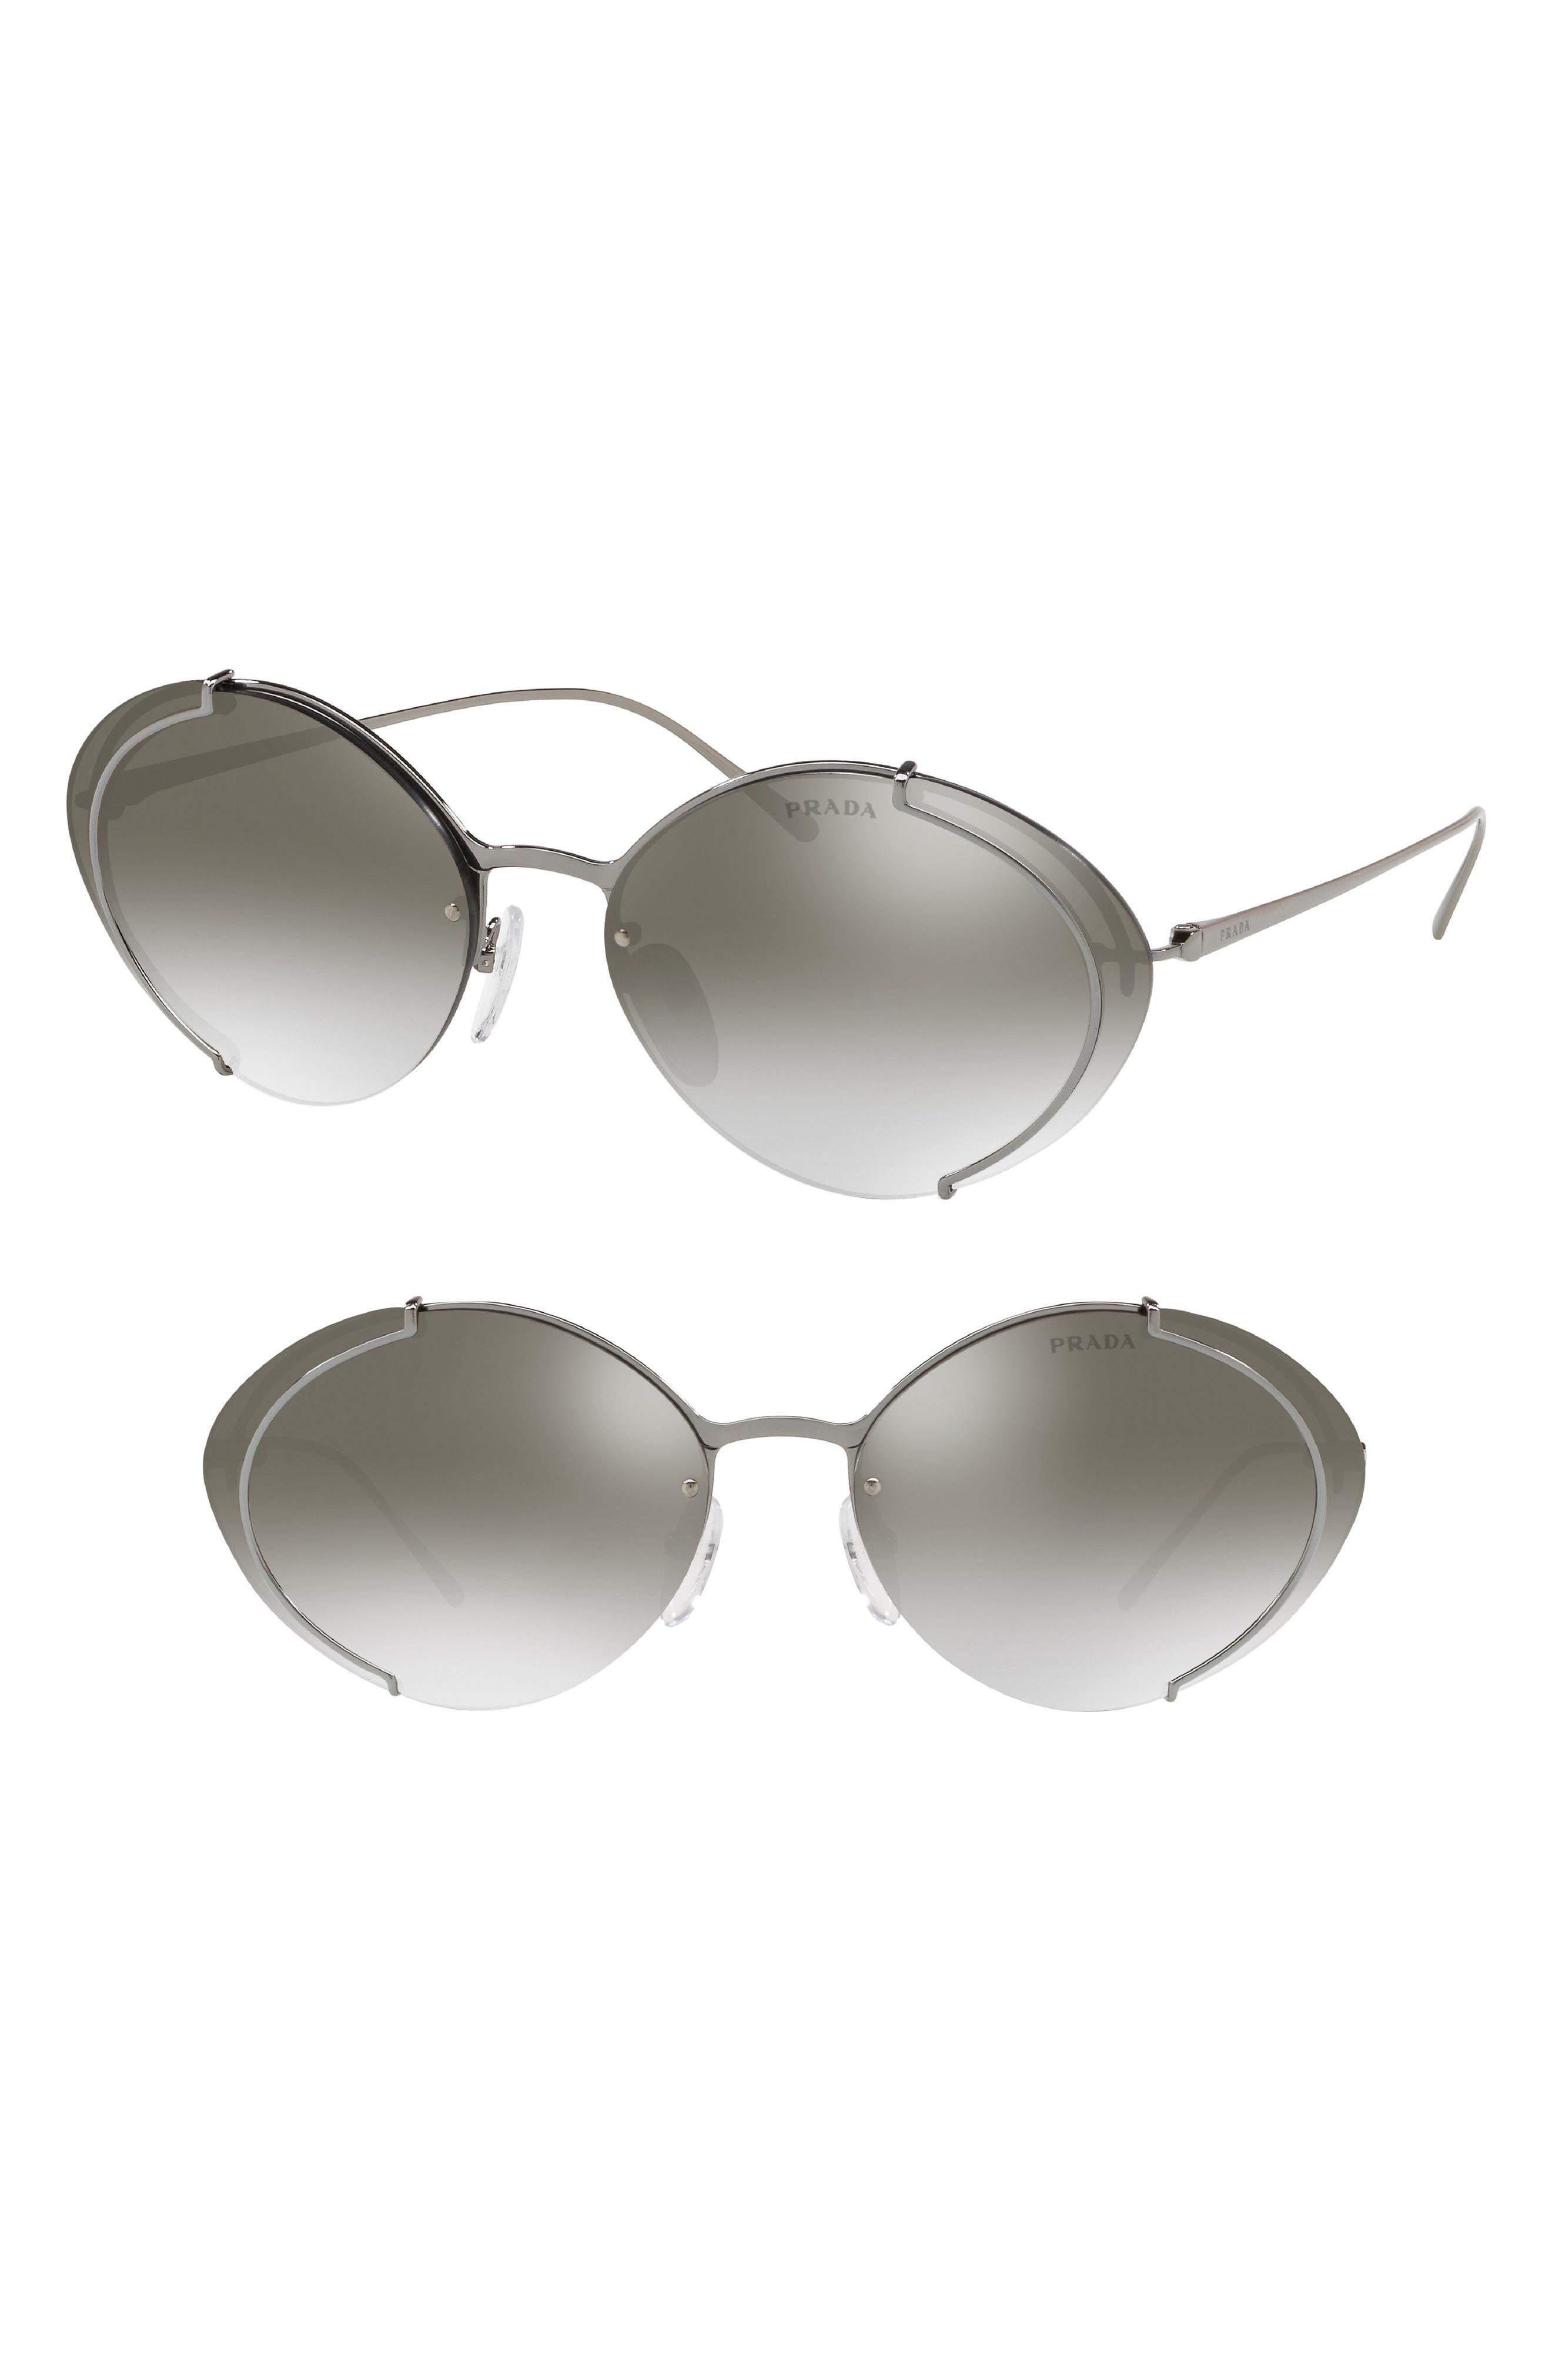 Evolution 63mm Oversize Rimless Oval Sunglasses,                             Main thumbnail 1, color,                             040